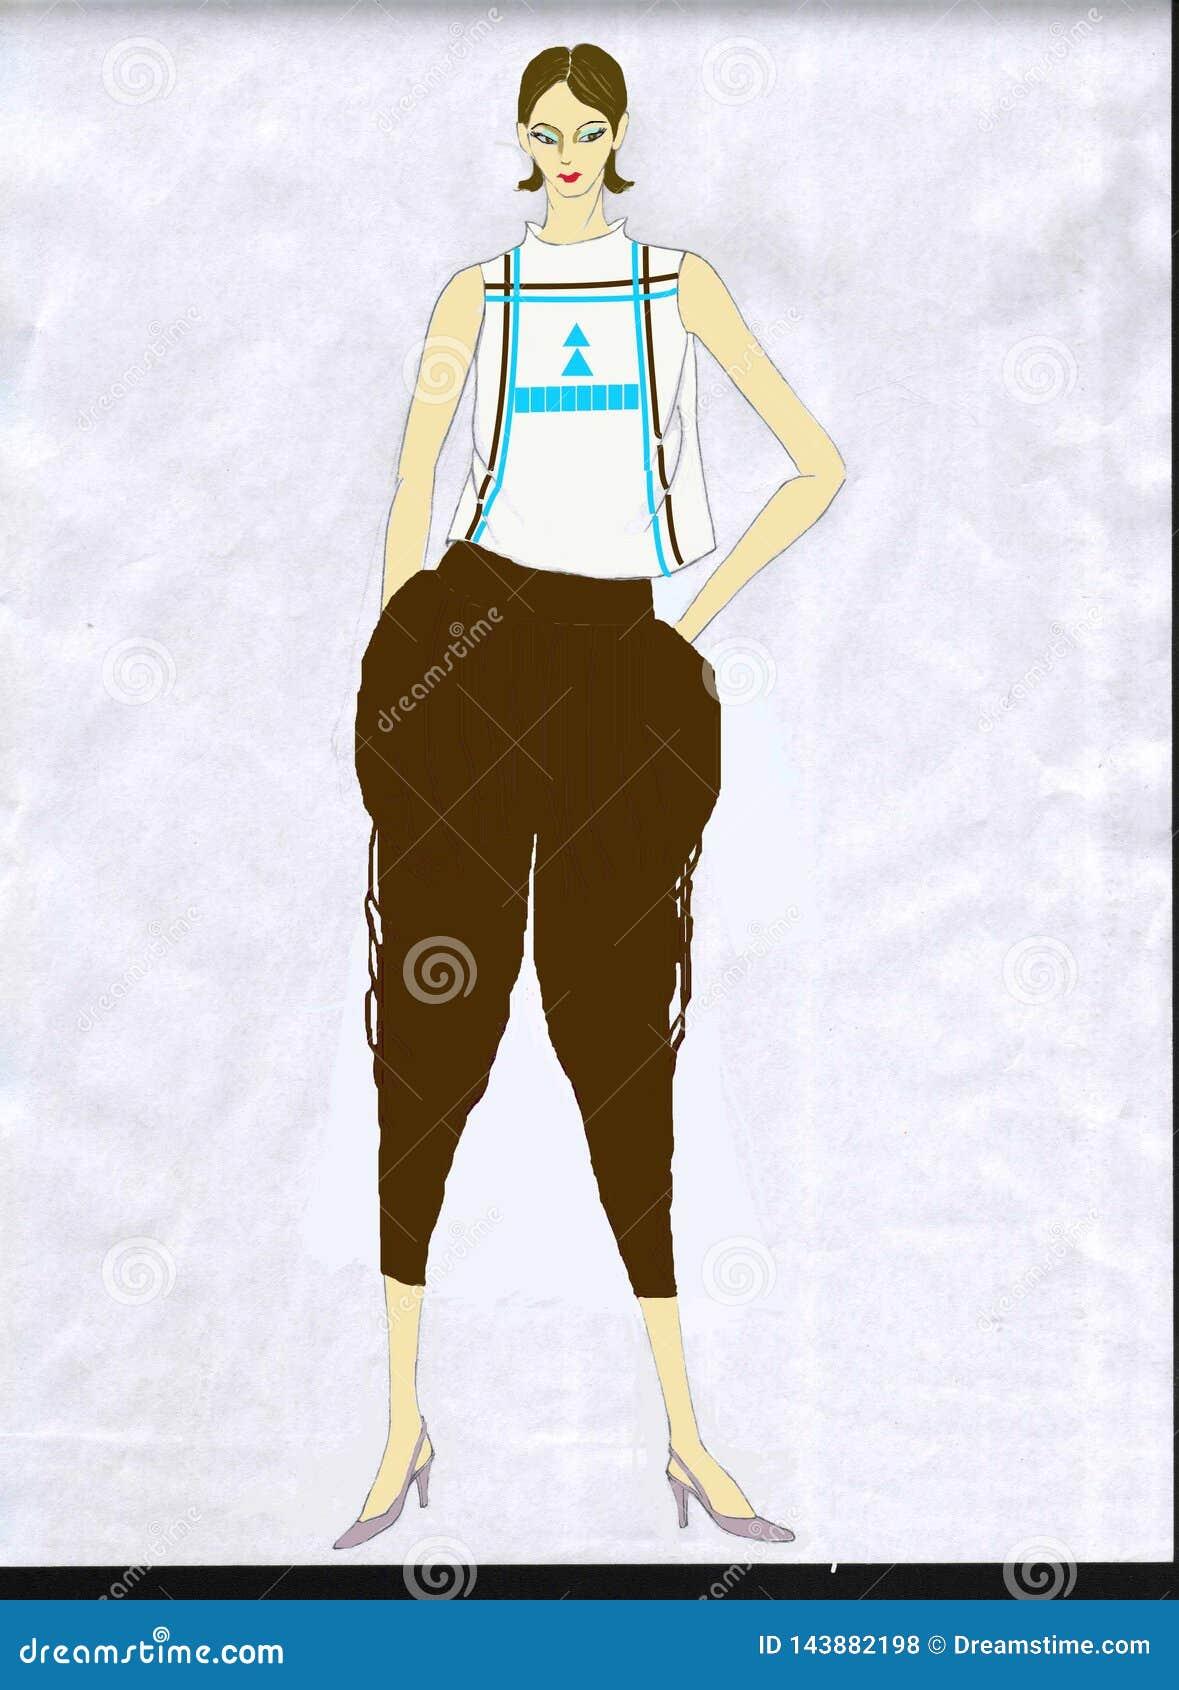 Manierontwerp - betere Chinese kleding - vrijetijdskleding